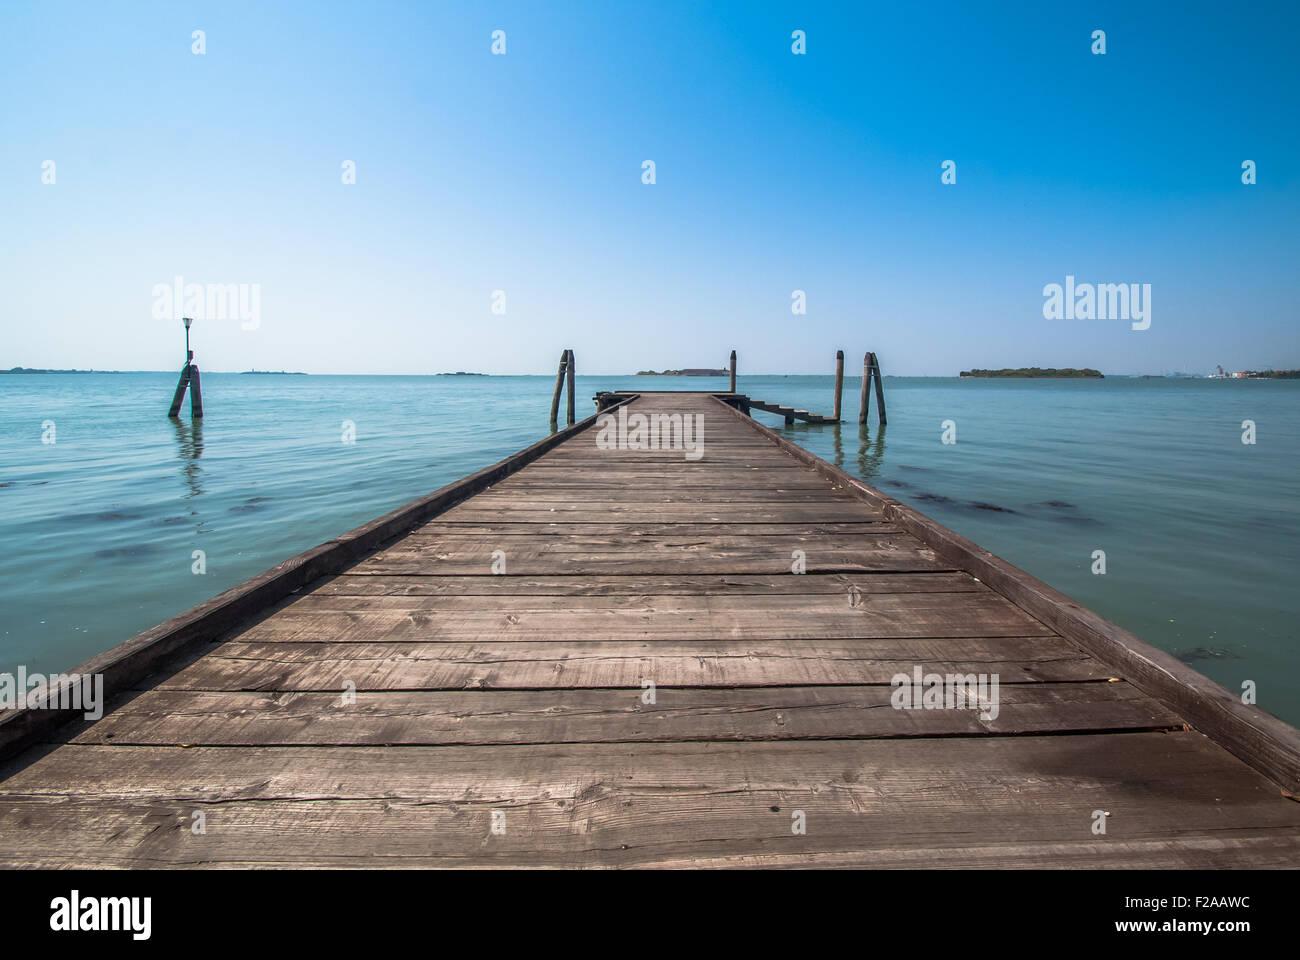 Wooden Bridge in San Servolo inland in Venice Italy - Stock Image